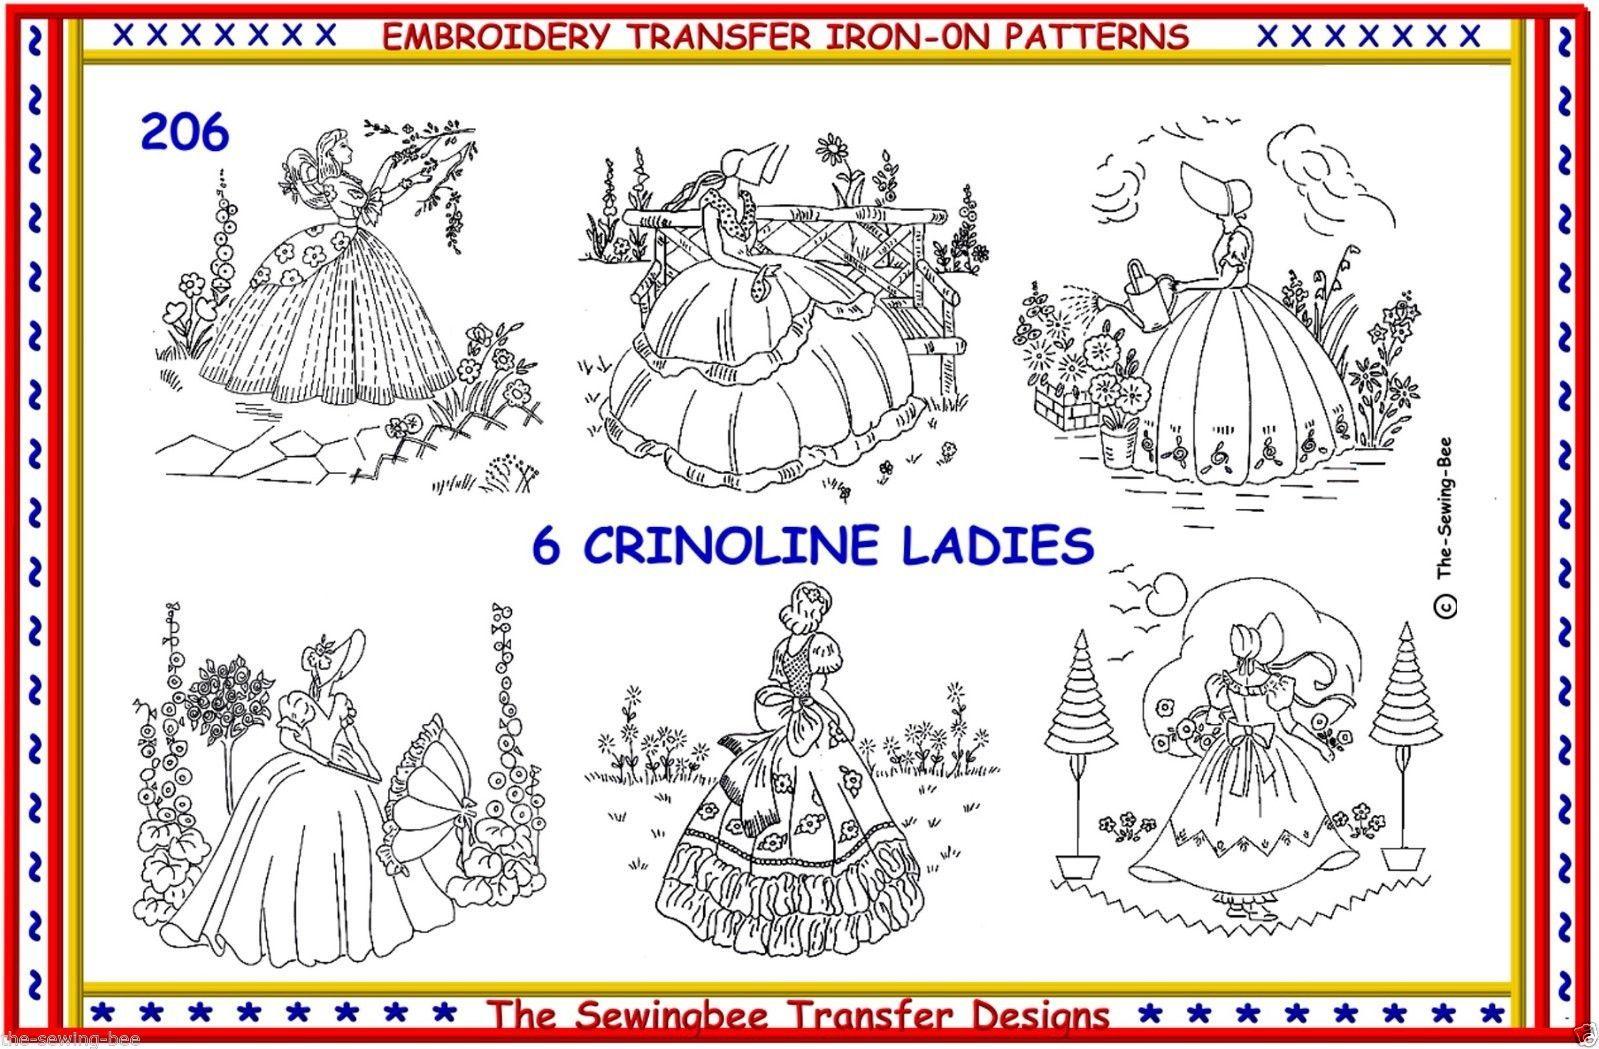 new crinoline lady ladies embroidery ironon transfers